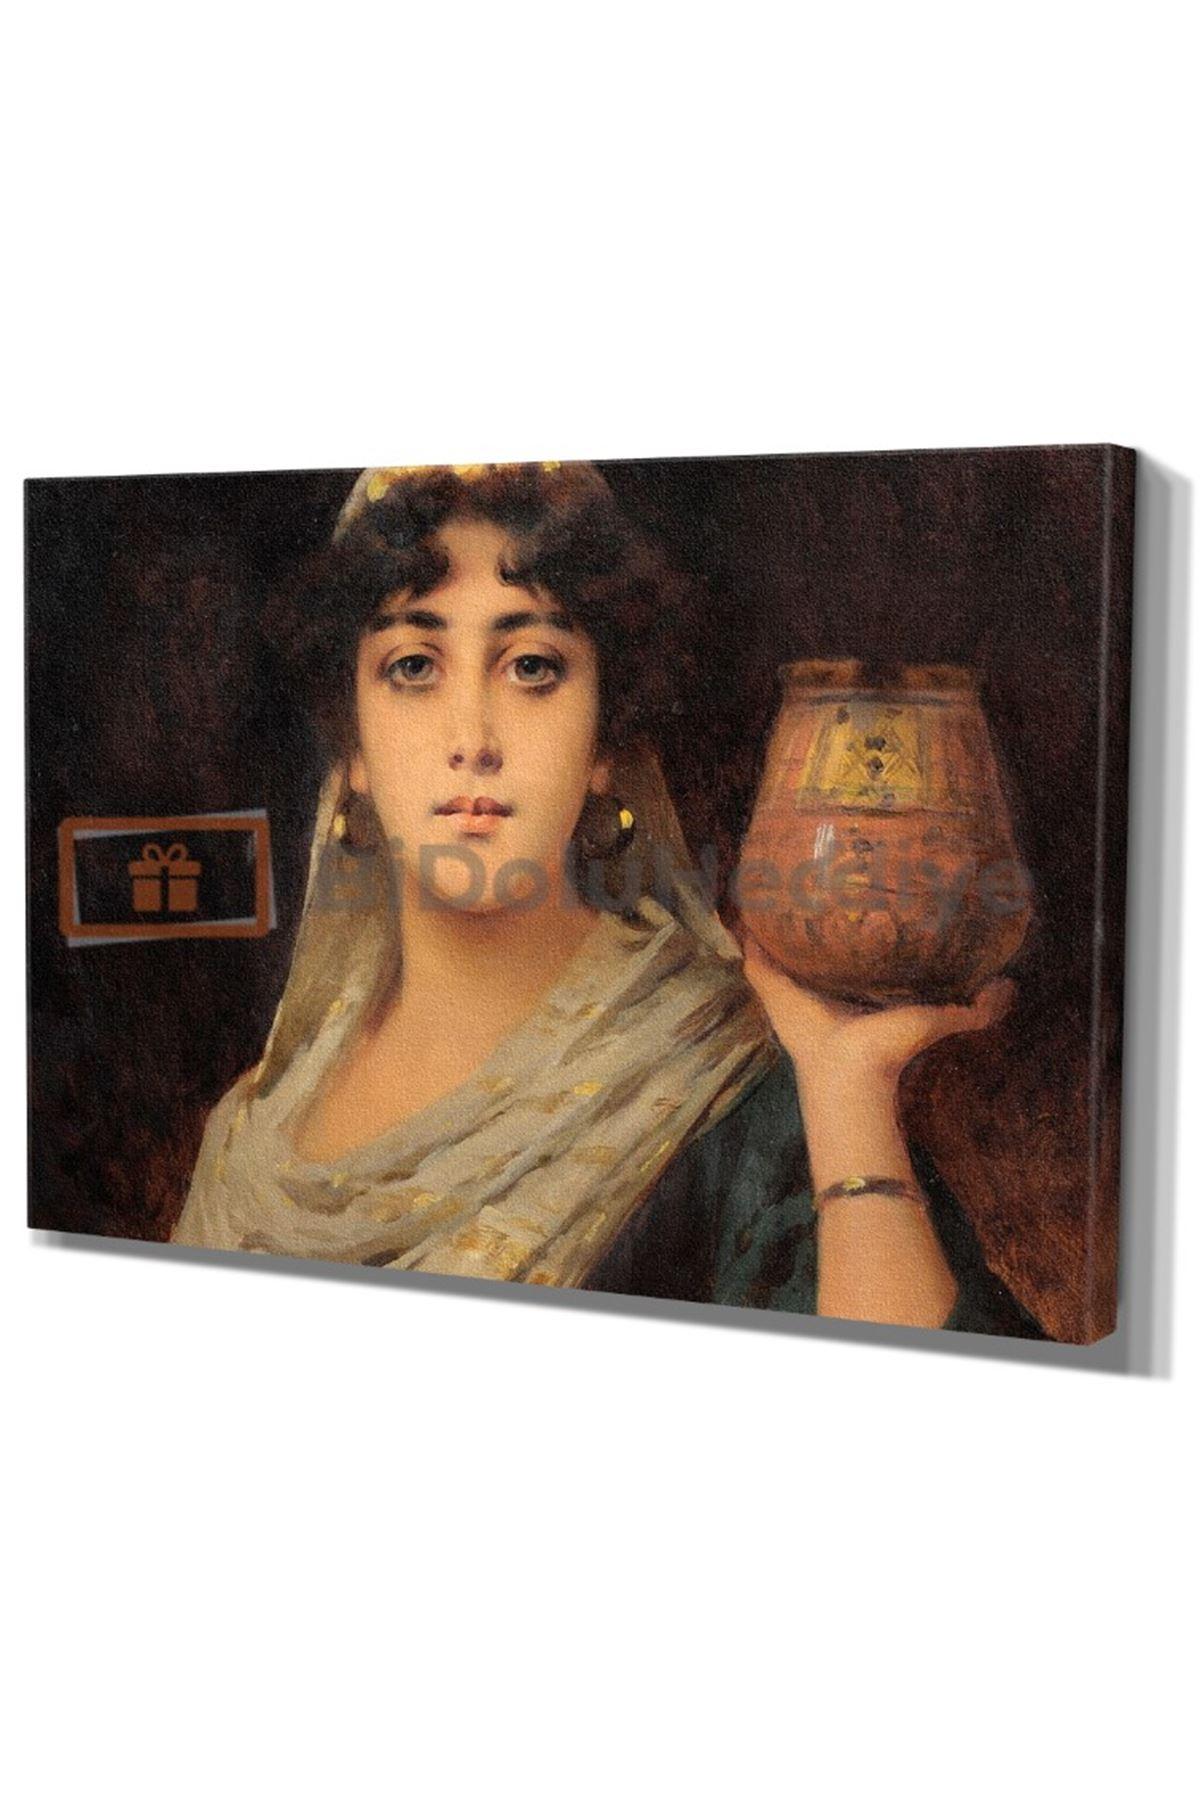 """Oriental Beauty"" Nathaniel Sichel ,1900 Dijital Baskı Kanvas Tablo"